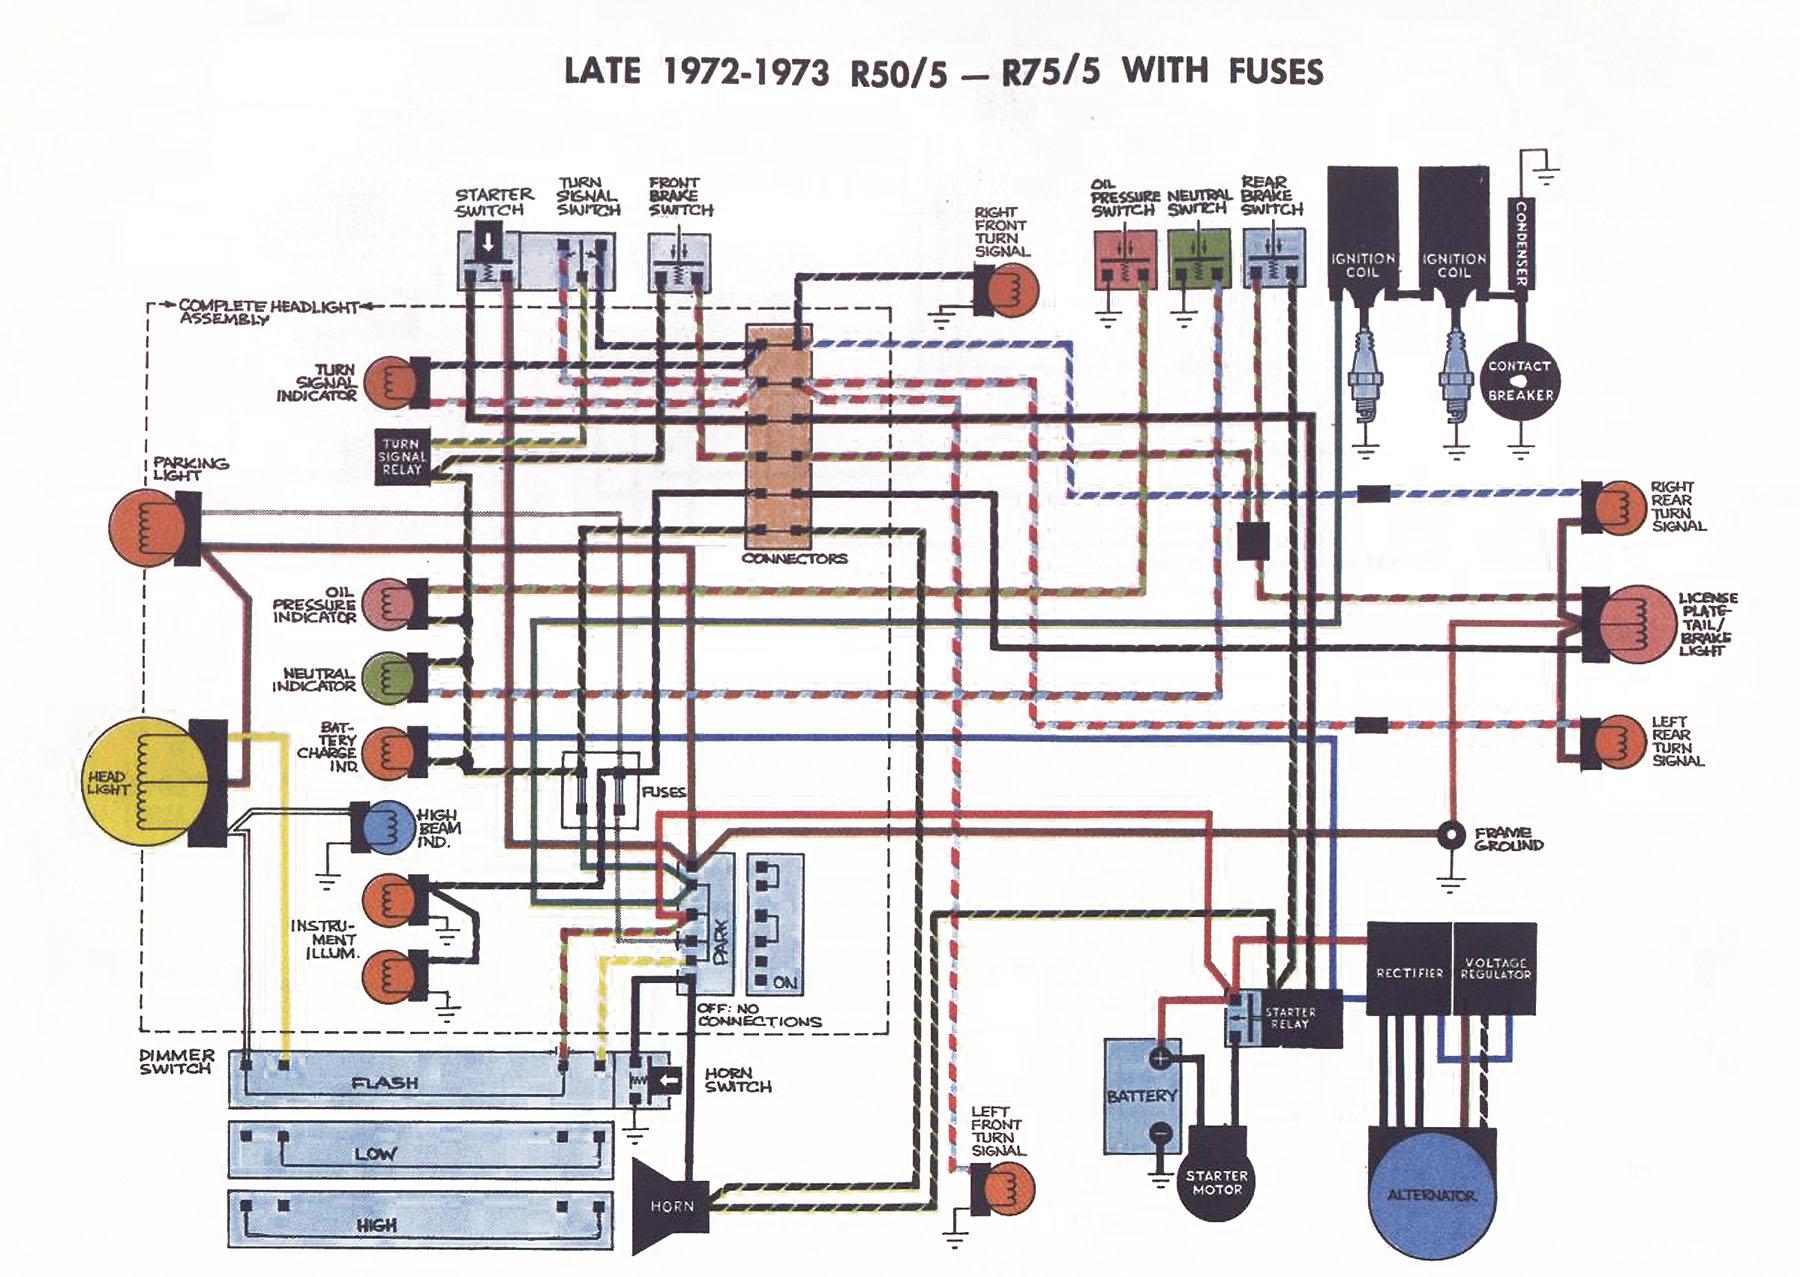 Peachy E92 Bmw Battery Location Free Download Wiring Diagram Schematic Wiring Cloud Hemtshollocom